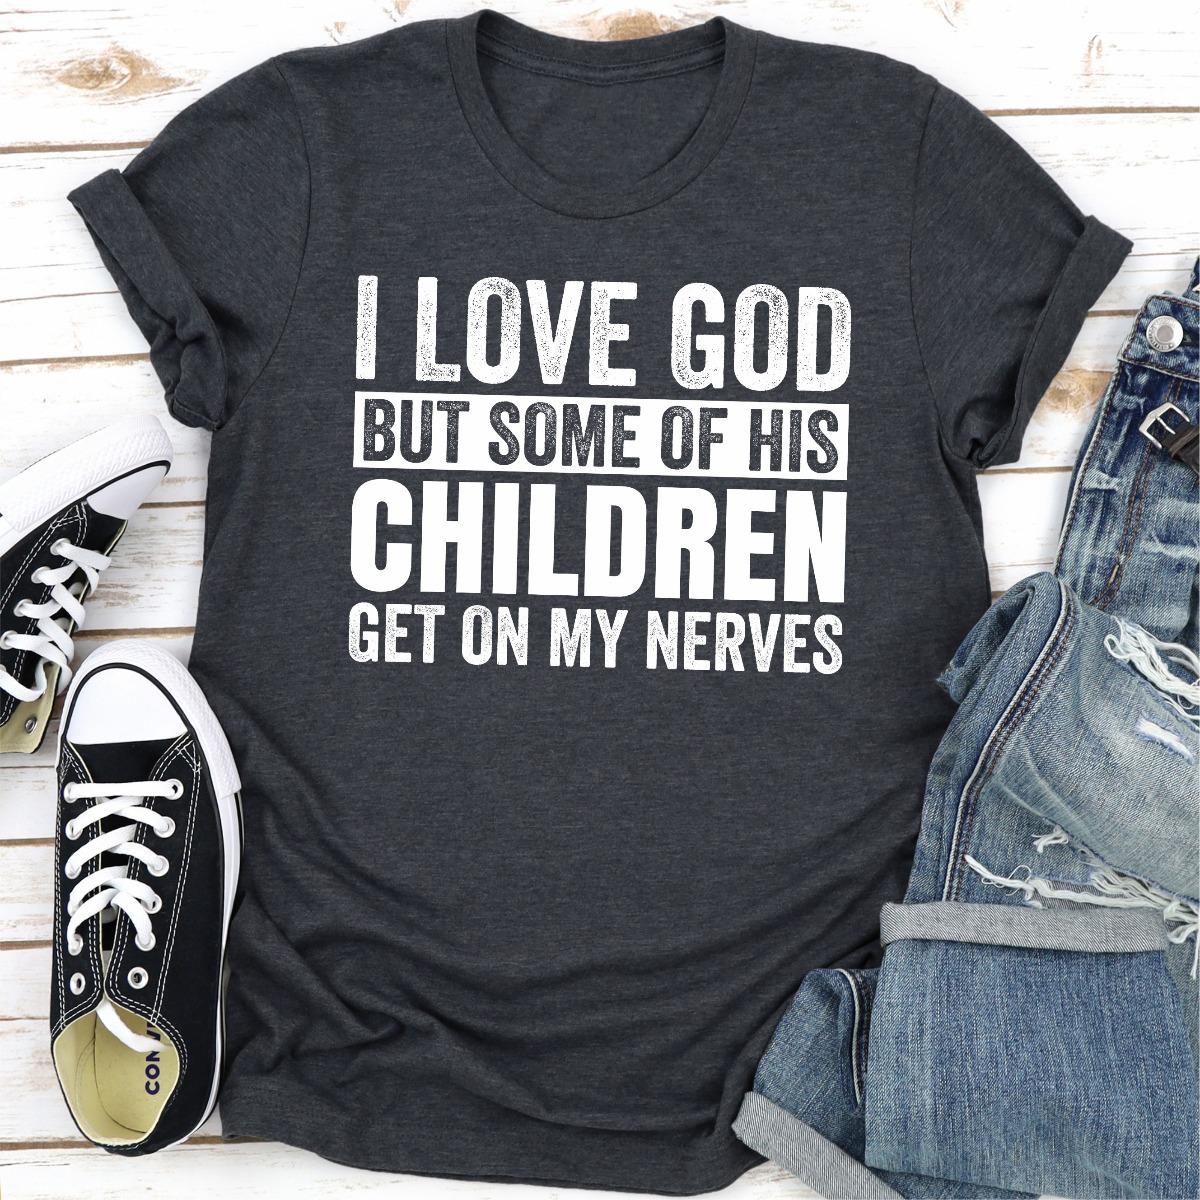 I Love God But Some Of His Children Get On My Nerves (Dark Heather / L)